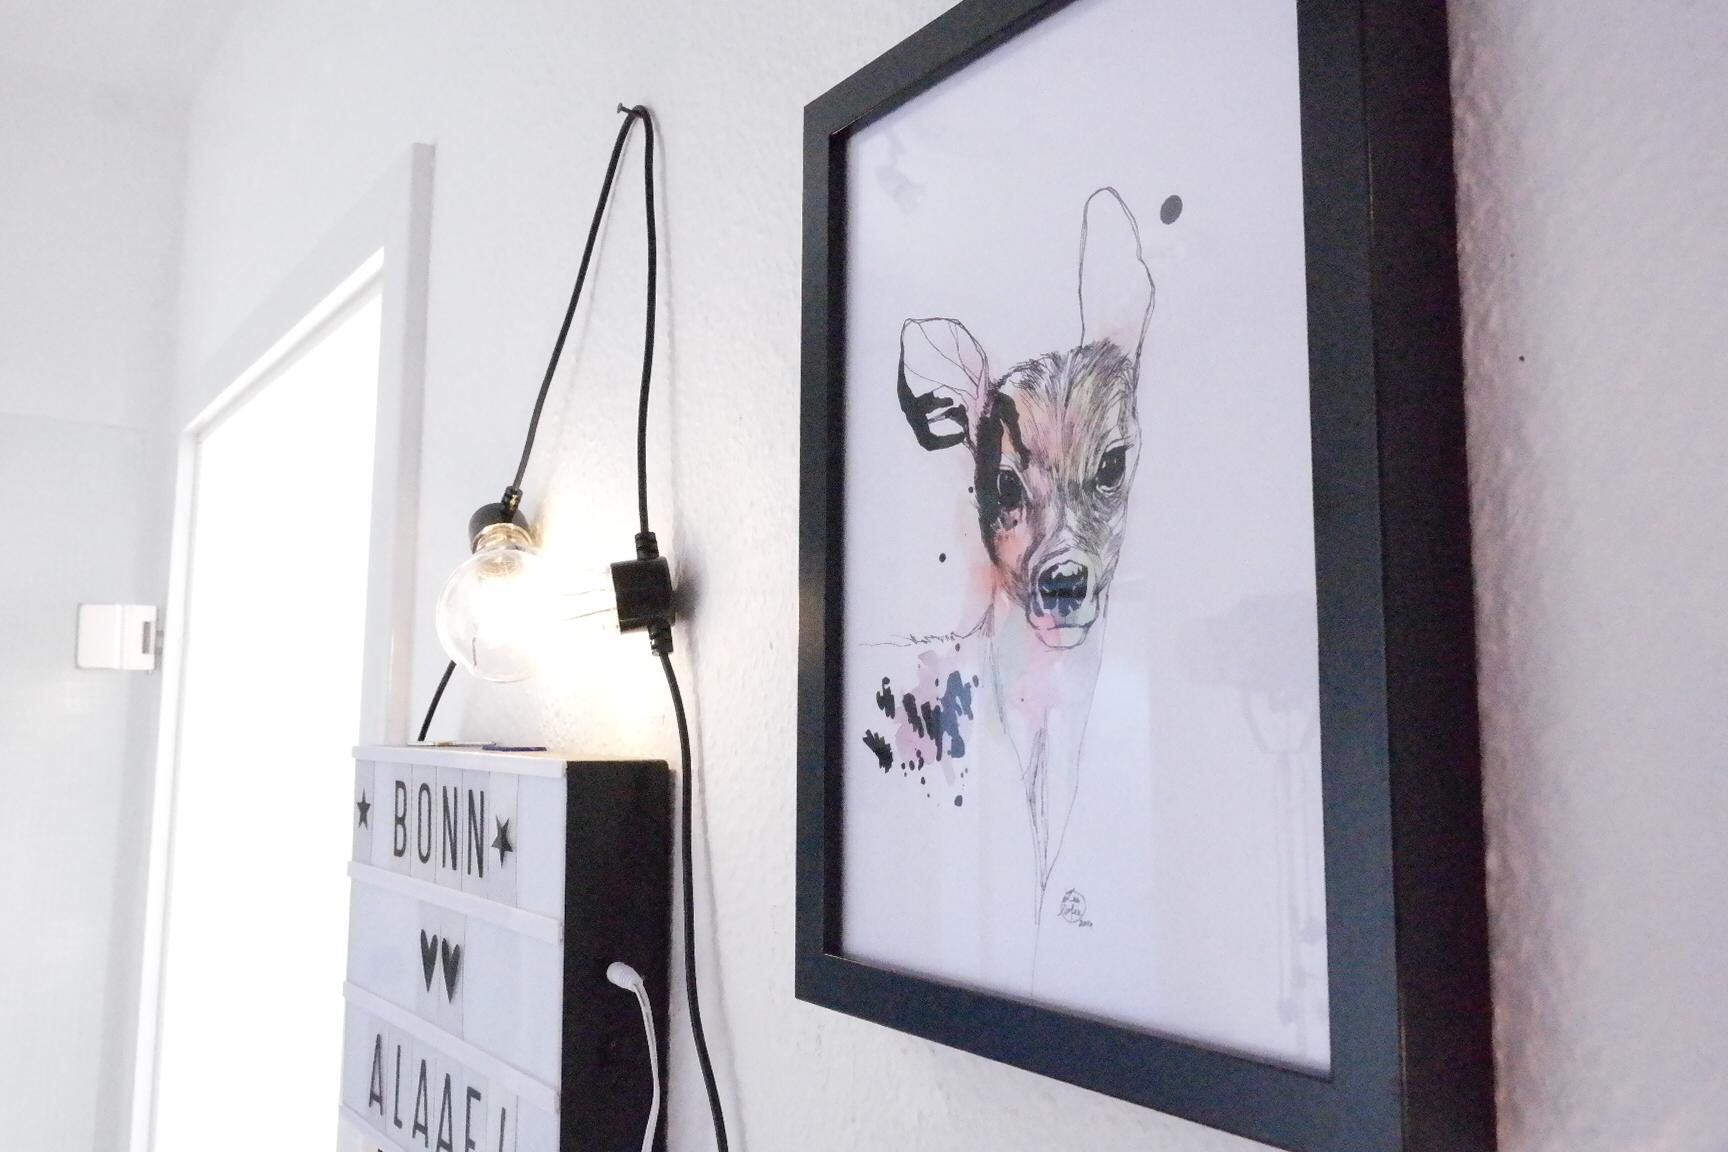 living ein neuer look flur umgestalten ein gewinnspiel missbonn e bonn e. Black Bedroom Furniture Sets. Home Design Ideas